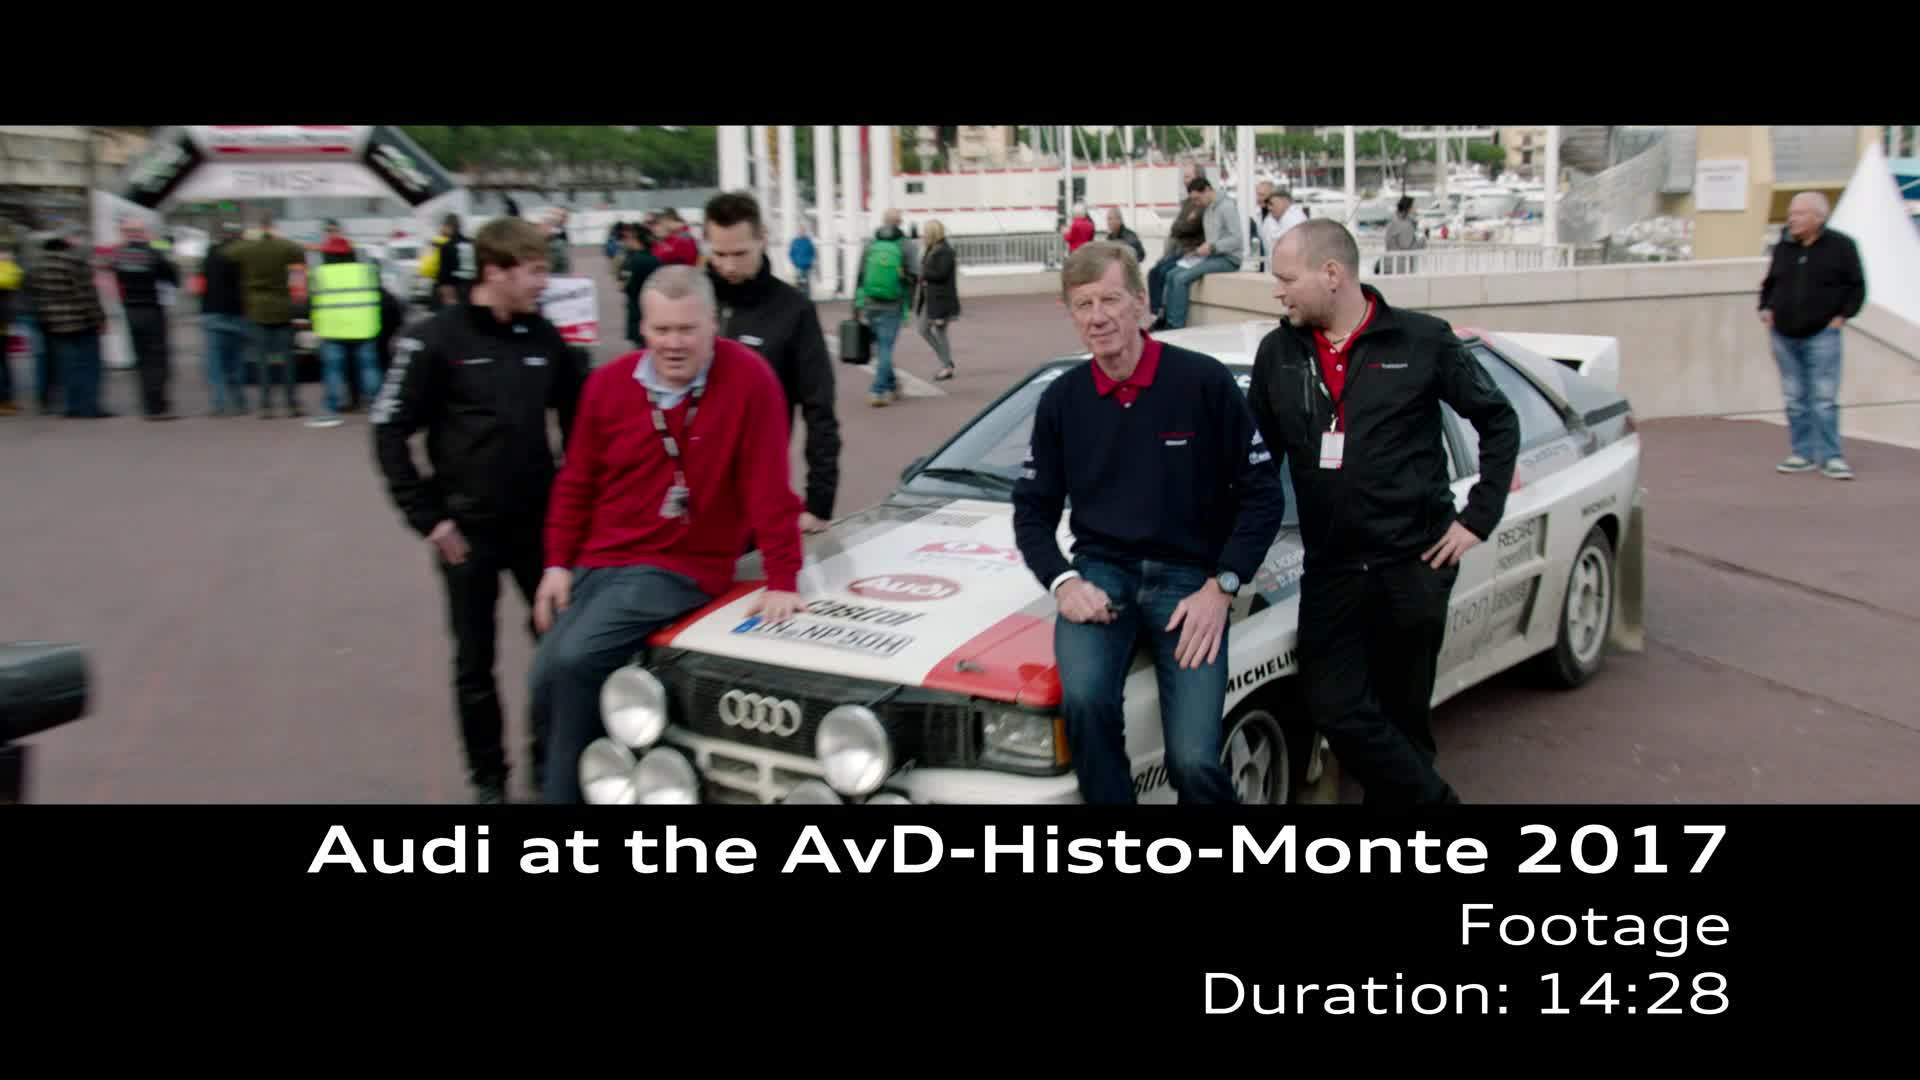 AvD-Histo-Monte 2017 - Footage